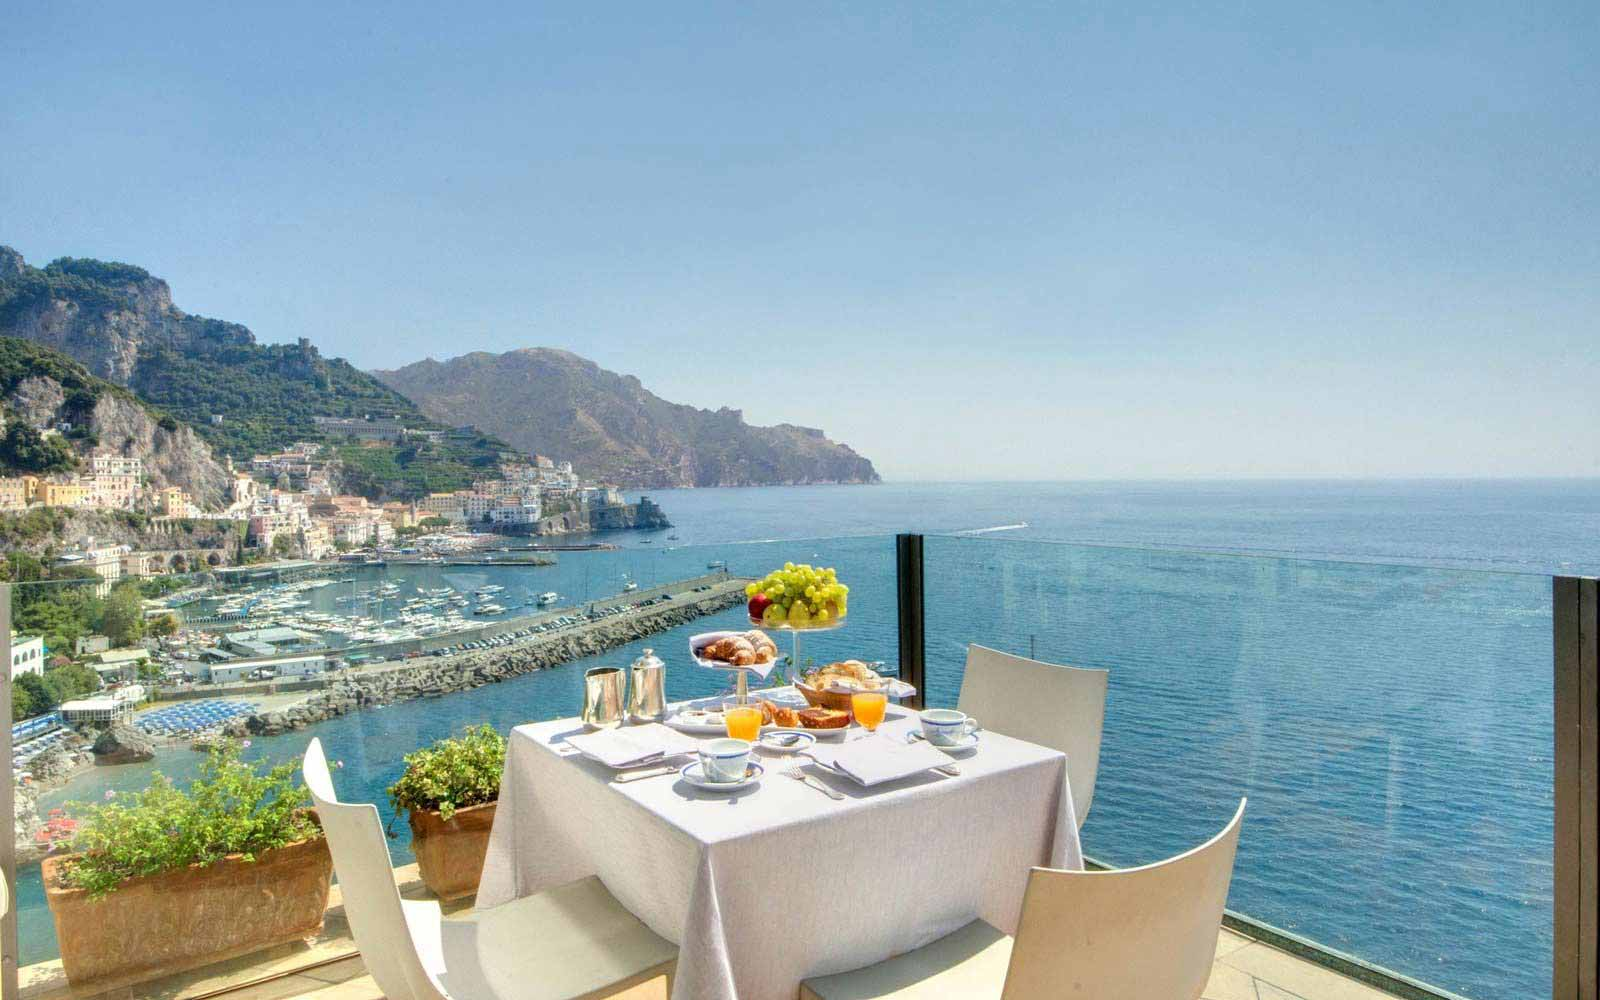 Breakfast at  Hotel Miramalfi